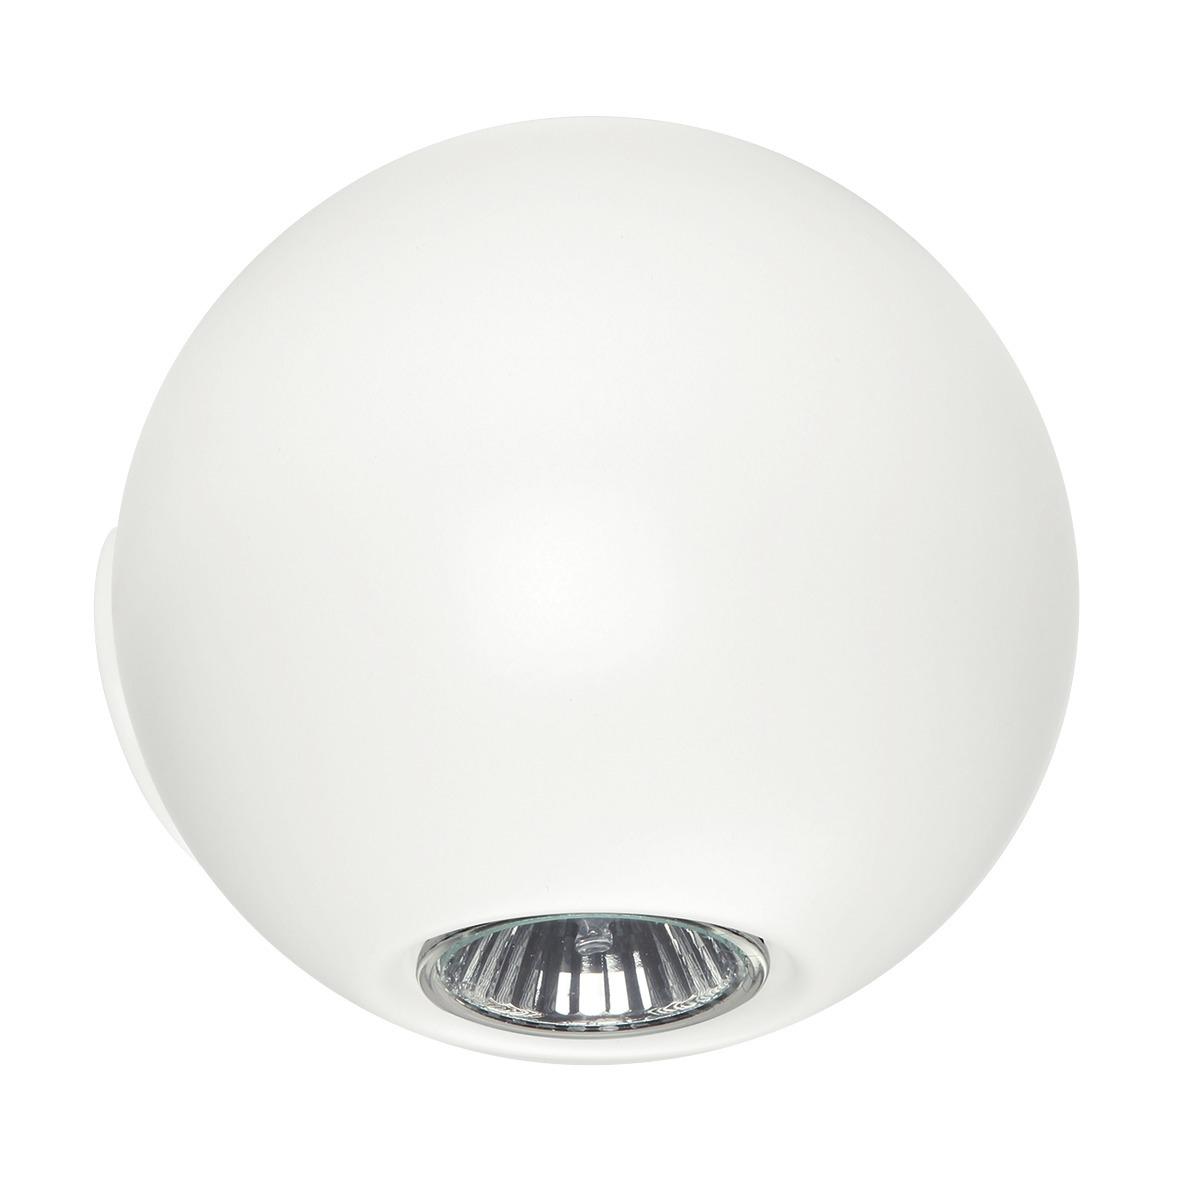 Faretti A Parete Design.Faretto Da Parete Design Sferico Bianco Opaco Gu10 Led Luce Up Down Pelota Linea Light